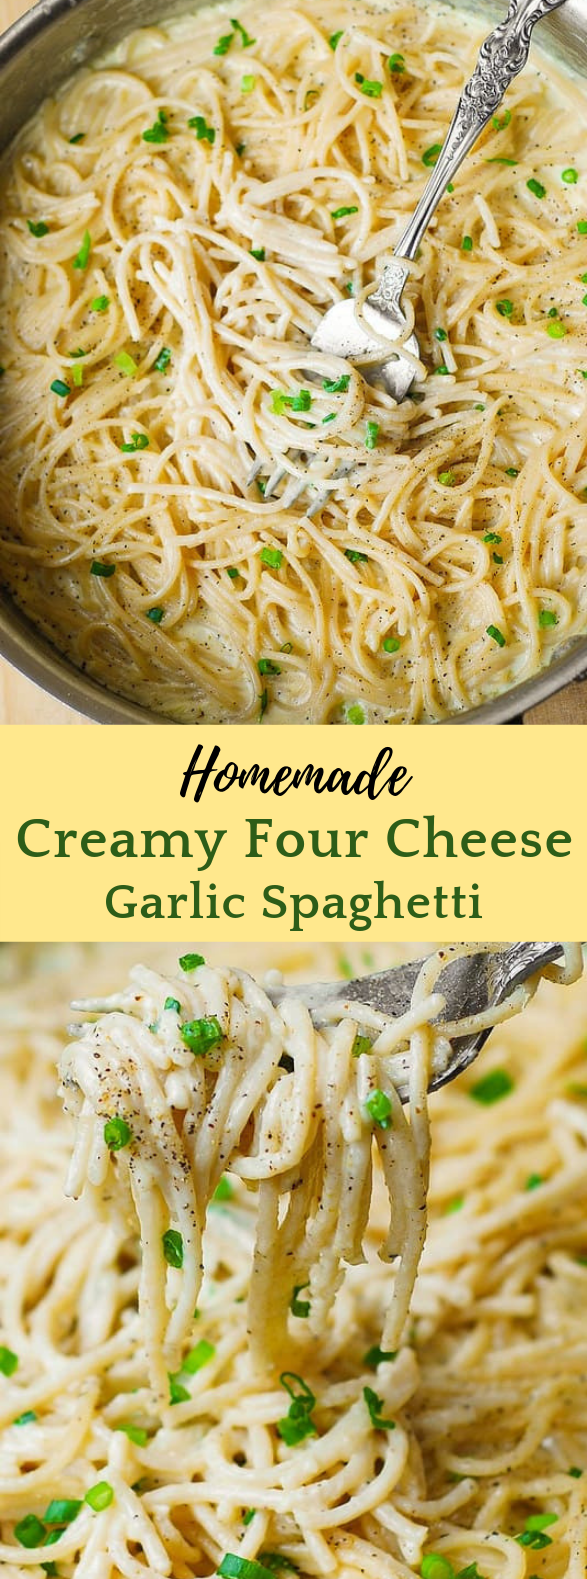 FOUR CHEESE GARLIC WHITE CREAM PASTA SAUCE #Dinner #Pasta images